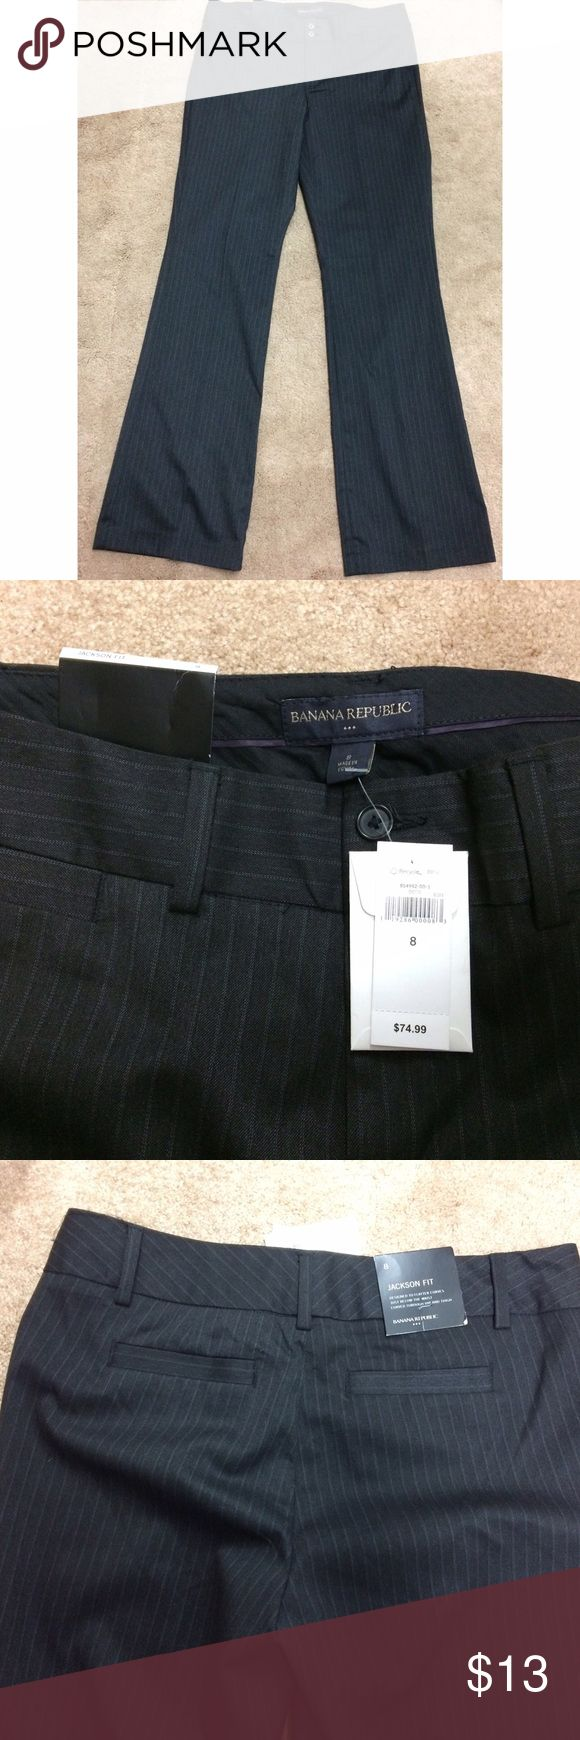 Banana Republic dress pants NWT Banana Republic Jackson fit pants. Perfect for a Curvy body type. Size 8 new with tags. Banana Republic Pants